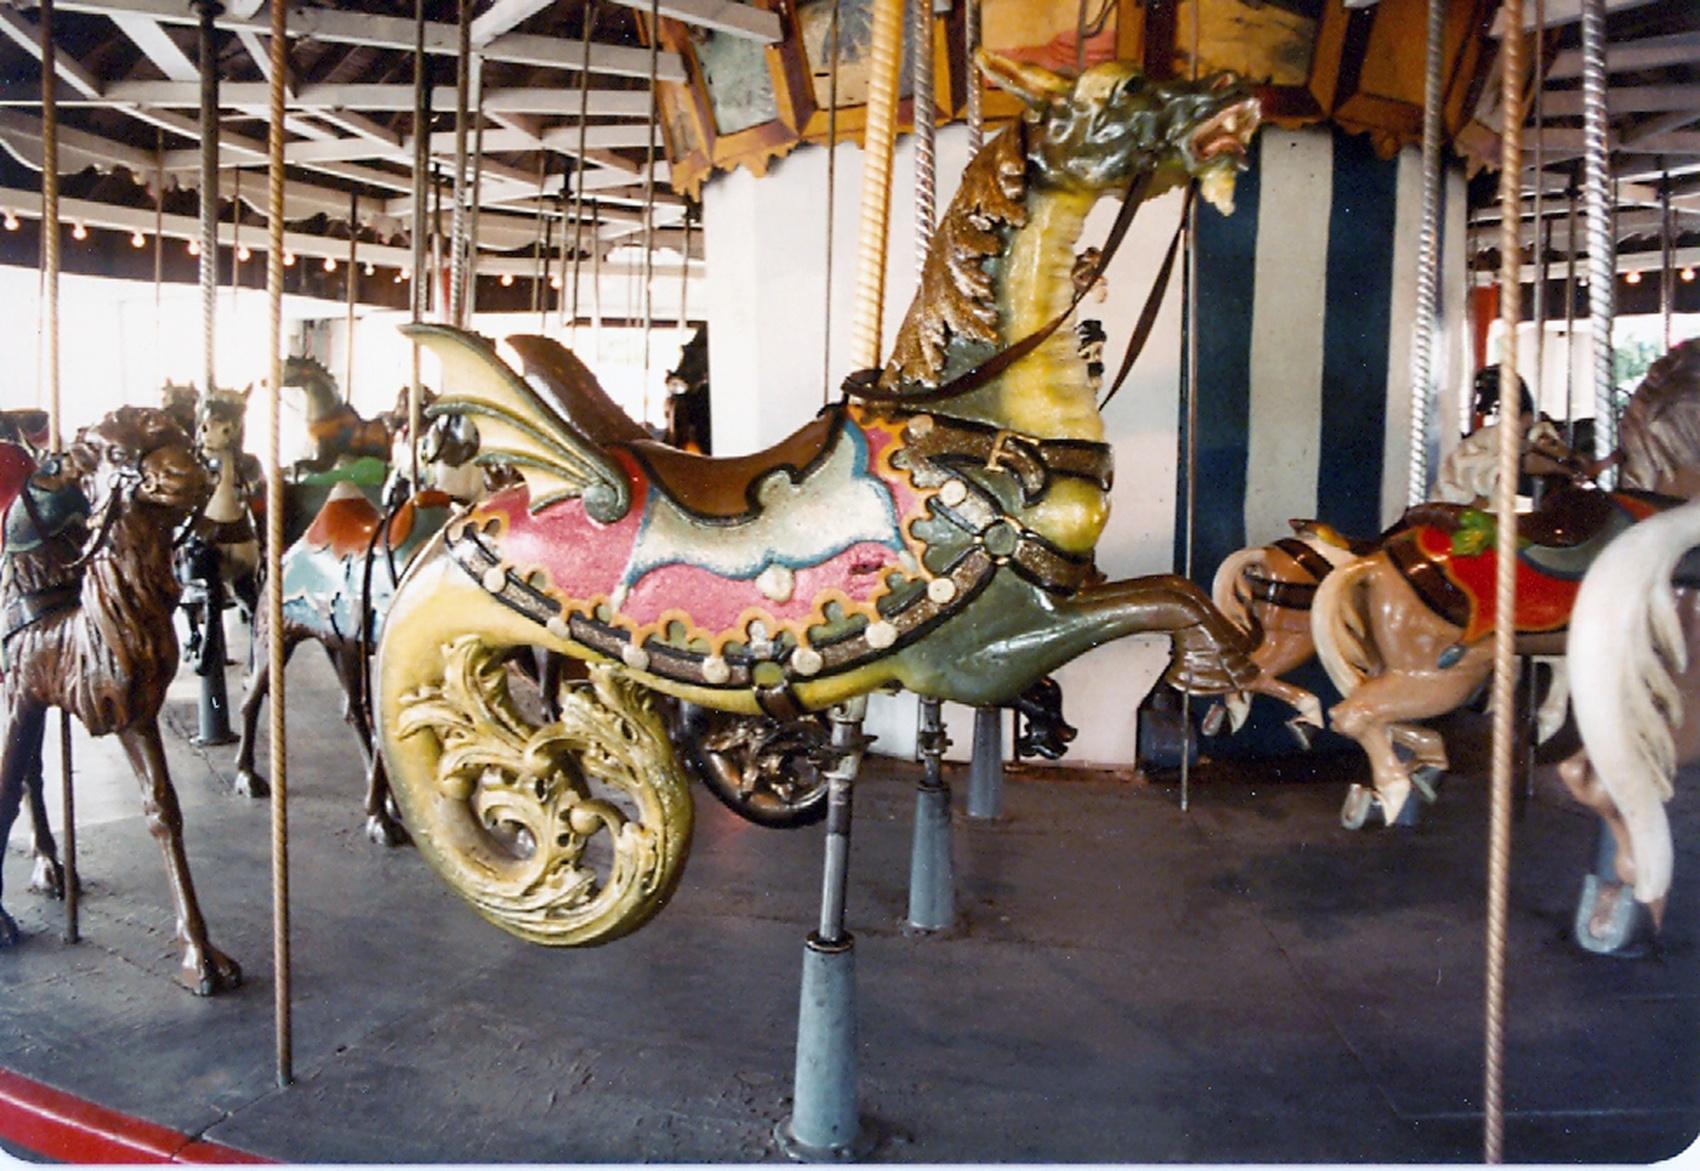 Lake-Quassy-Amusement-Park-E-Joy-Morris-Carousel-Seamonster